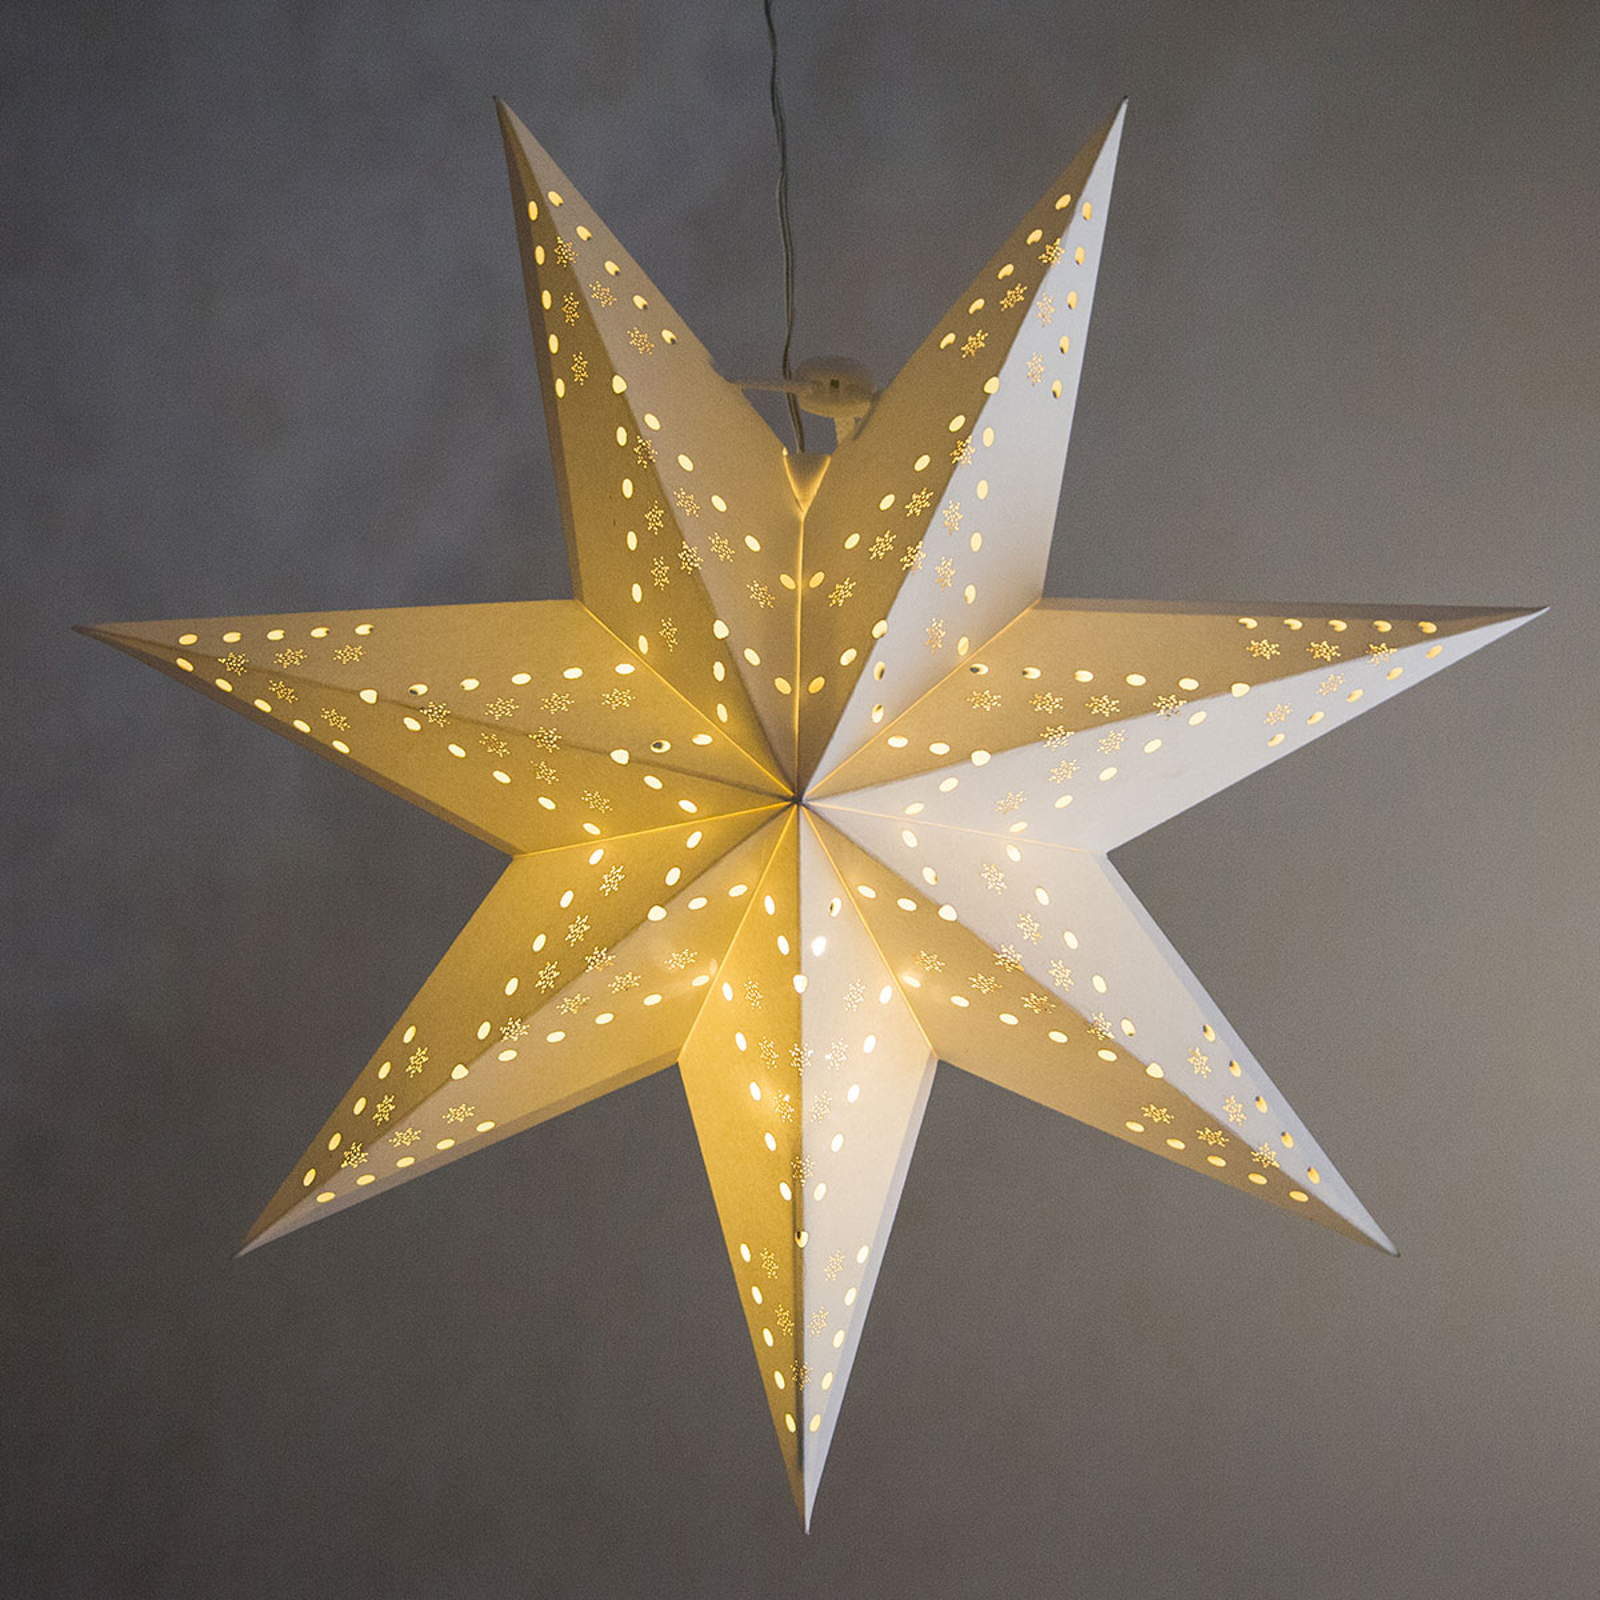 Hullmønster flak - LED-stjerne Cellcandle hvit